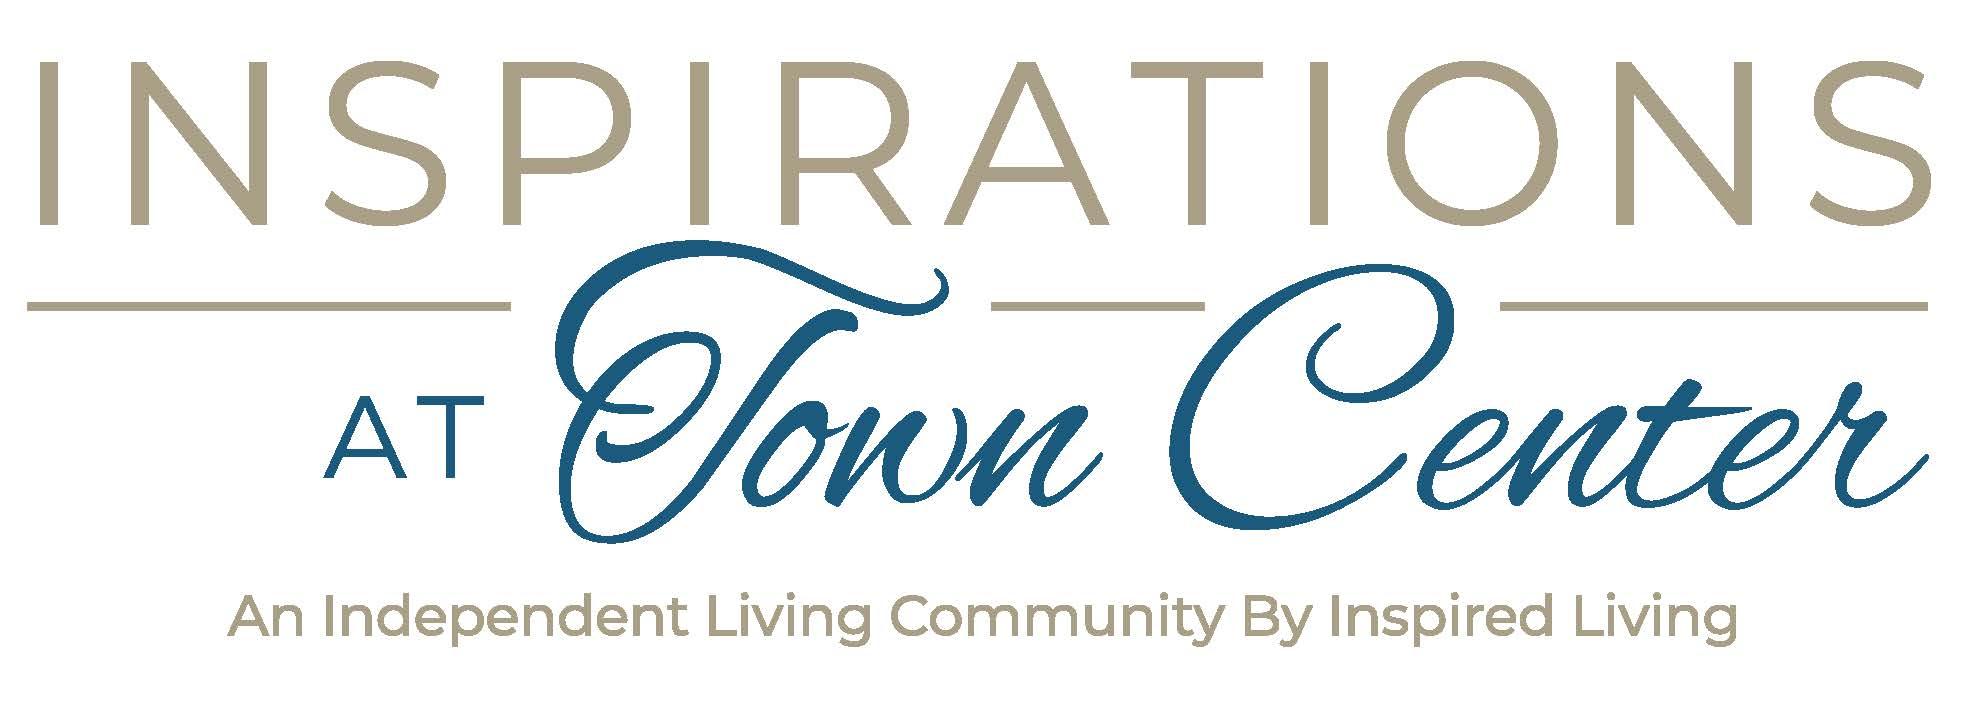 Inspirations at Towncenter Logo